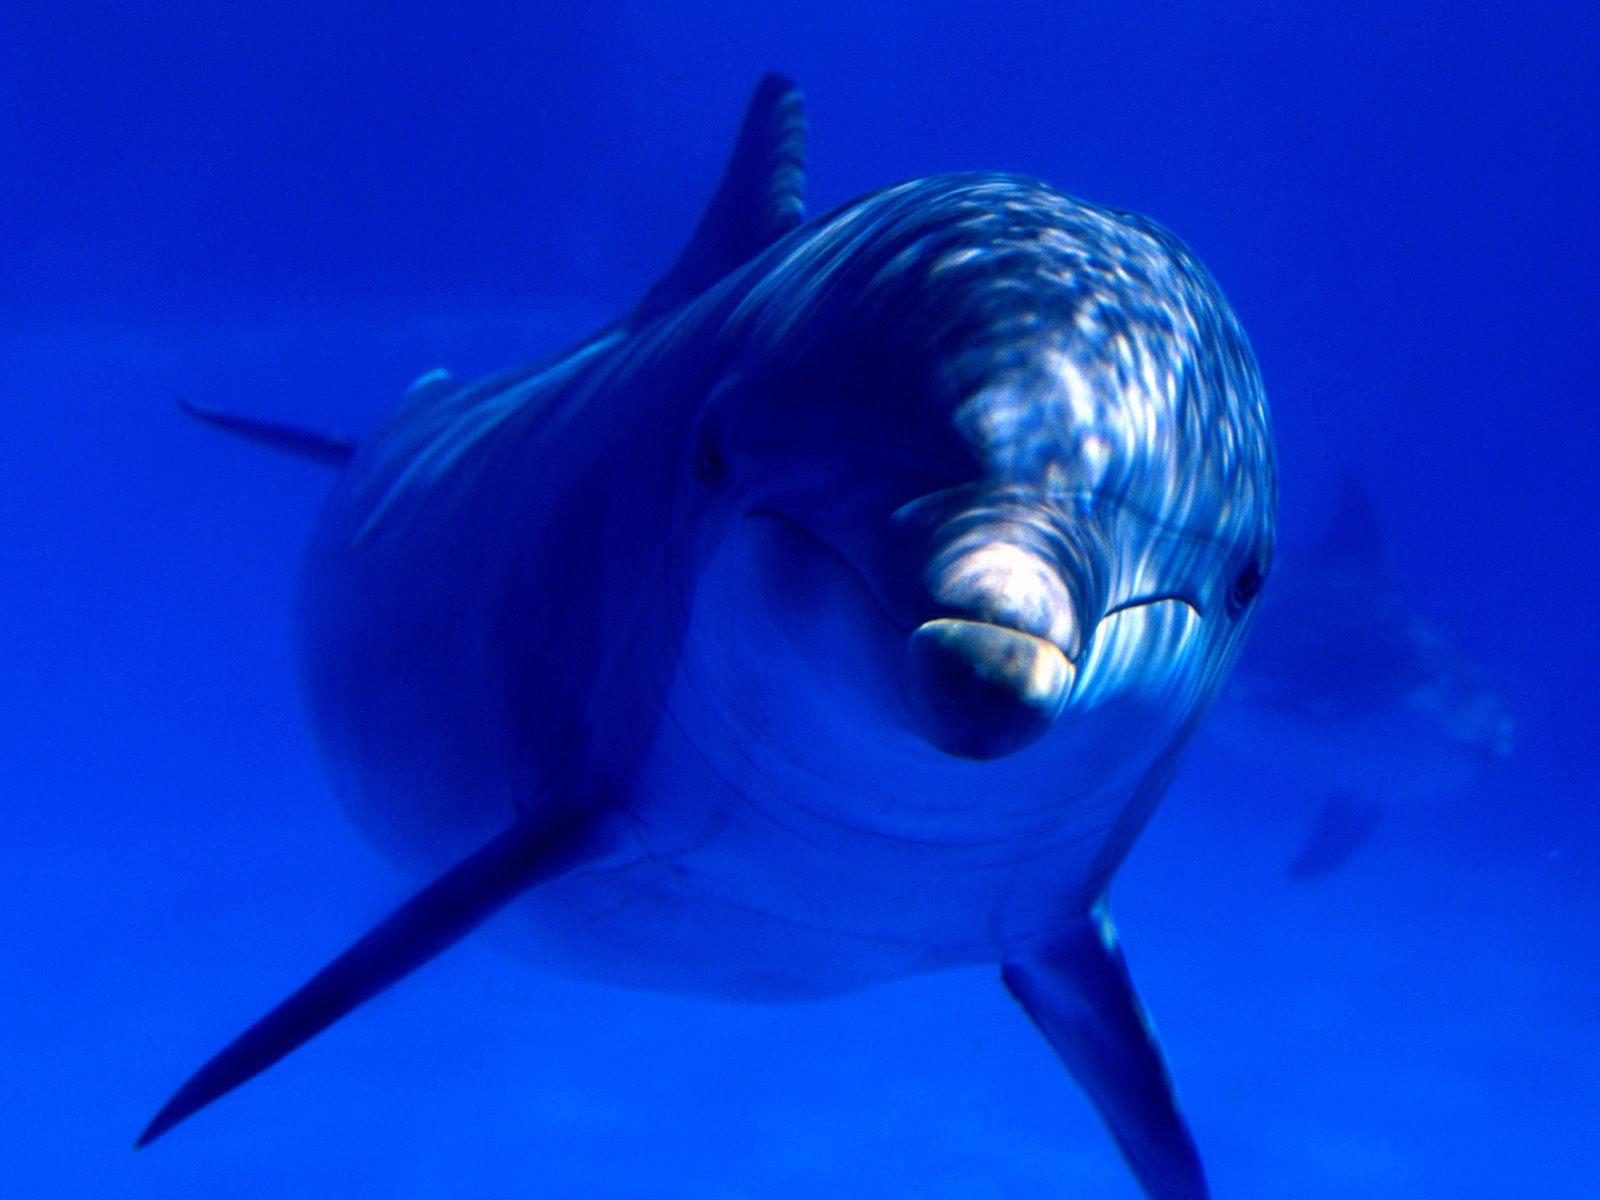 http://1.bp.blogspot.com/-vplx_qep9lw/T87Faeo36SI/AAAAAAAAHOI/HqYUT-2S2lg/s1600/ocean%2Bbackground%2B02.jpg